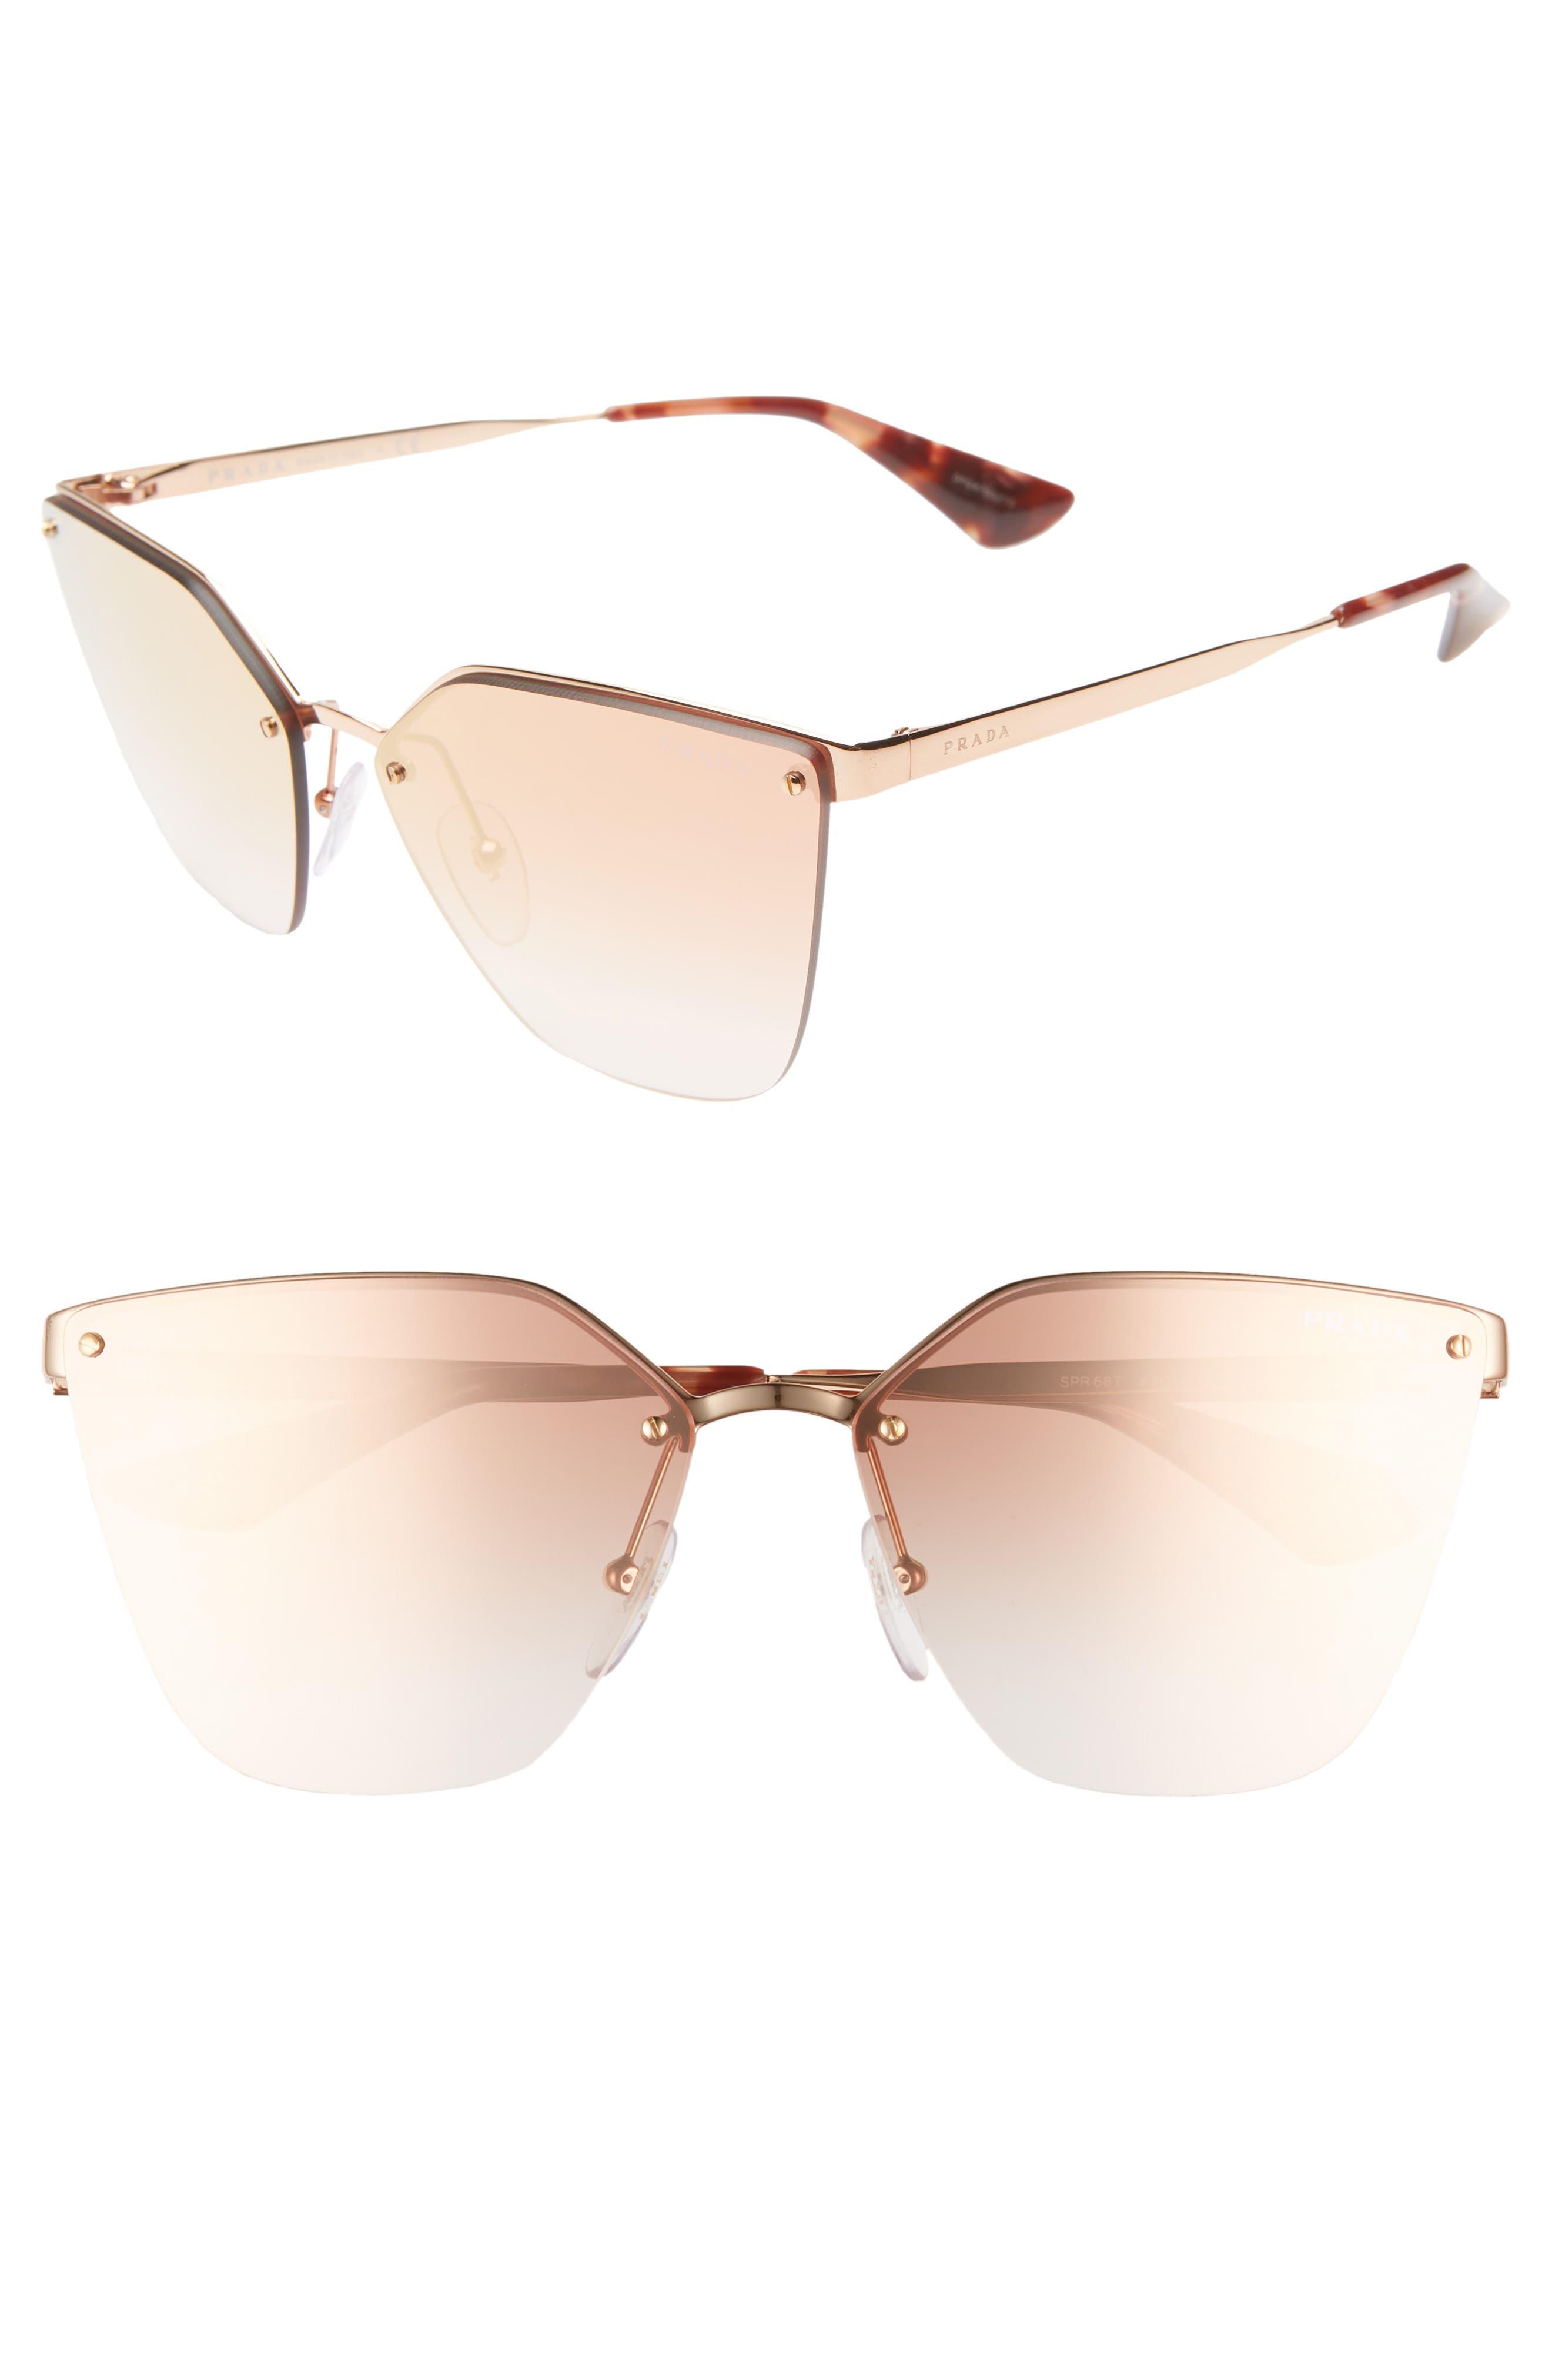 3eb541338fc6 Prada Sunglasses for Women